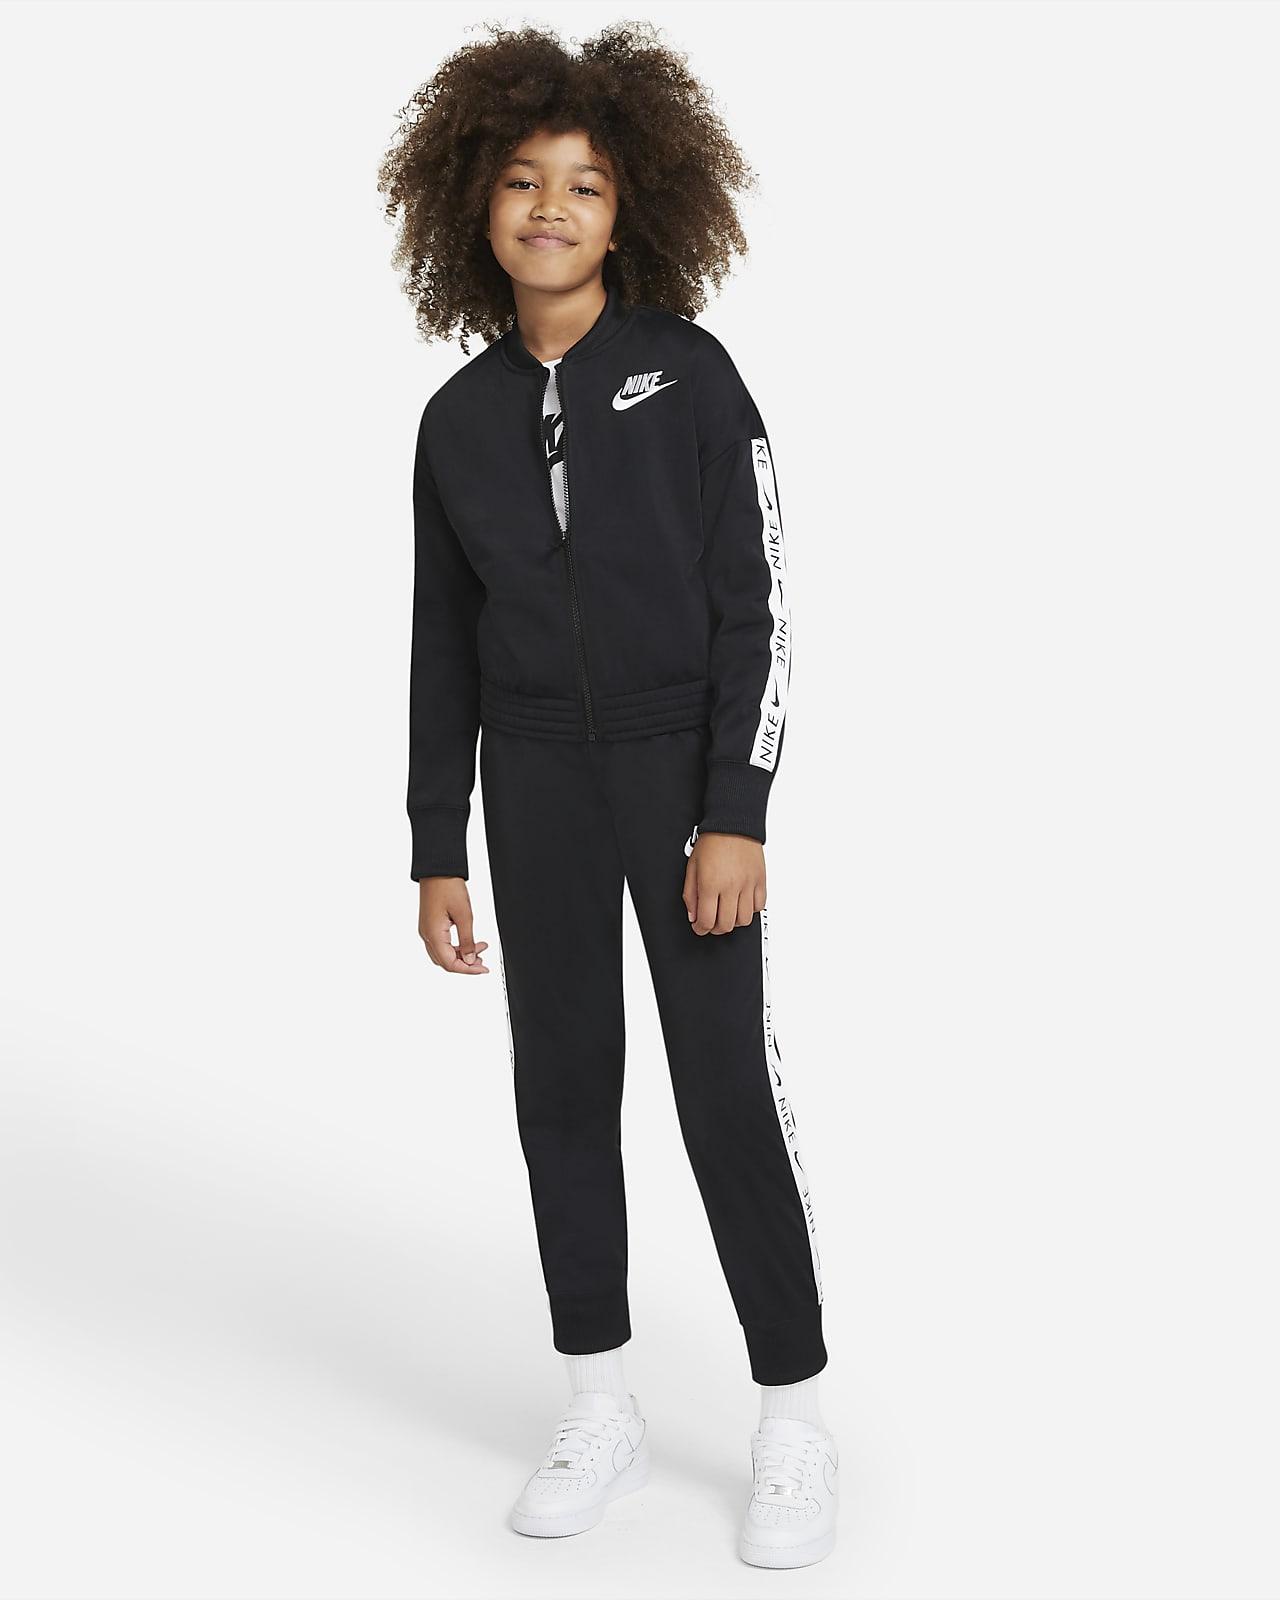 Fato de treino Nike Sportswear Júnior